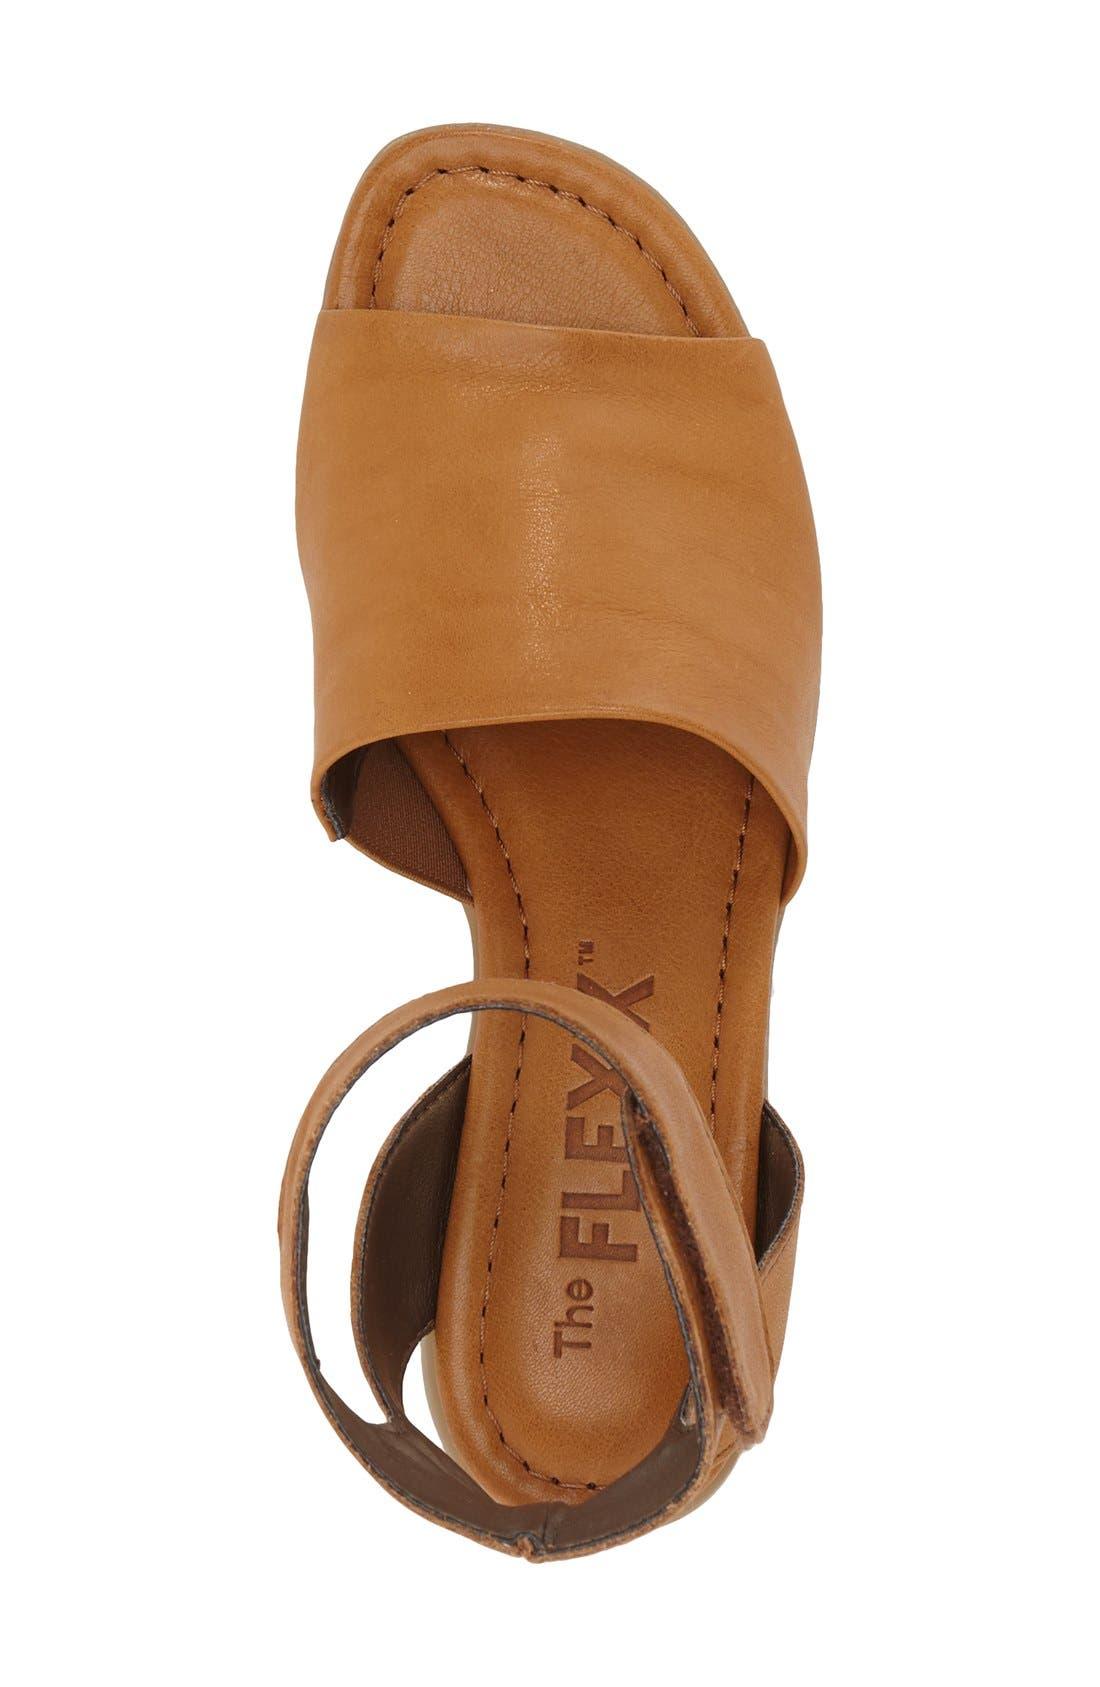 'Beglad' Leather Ankle Strap Sandal,                             Alternate thumbnail 6, color,                             Virginia Brown Leather